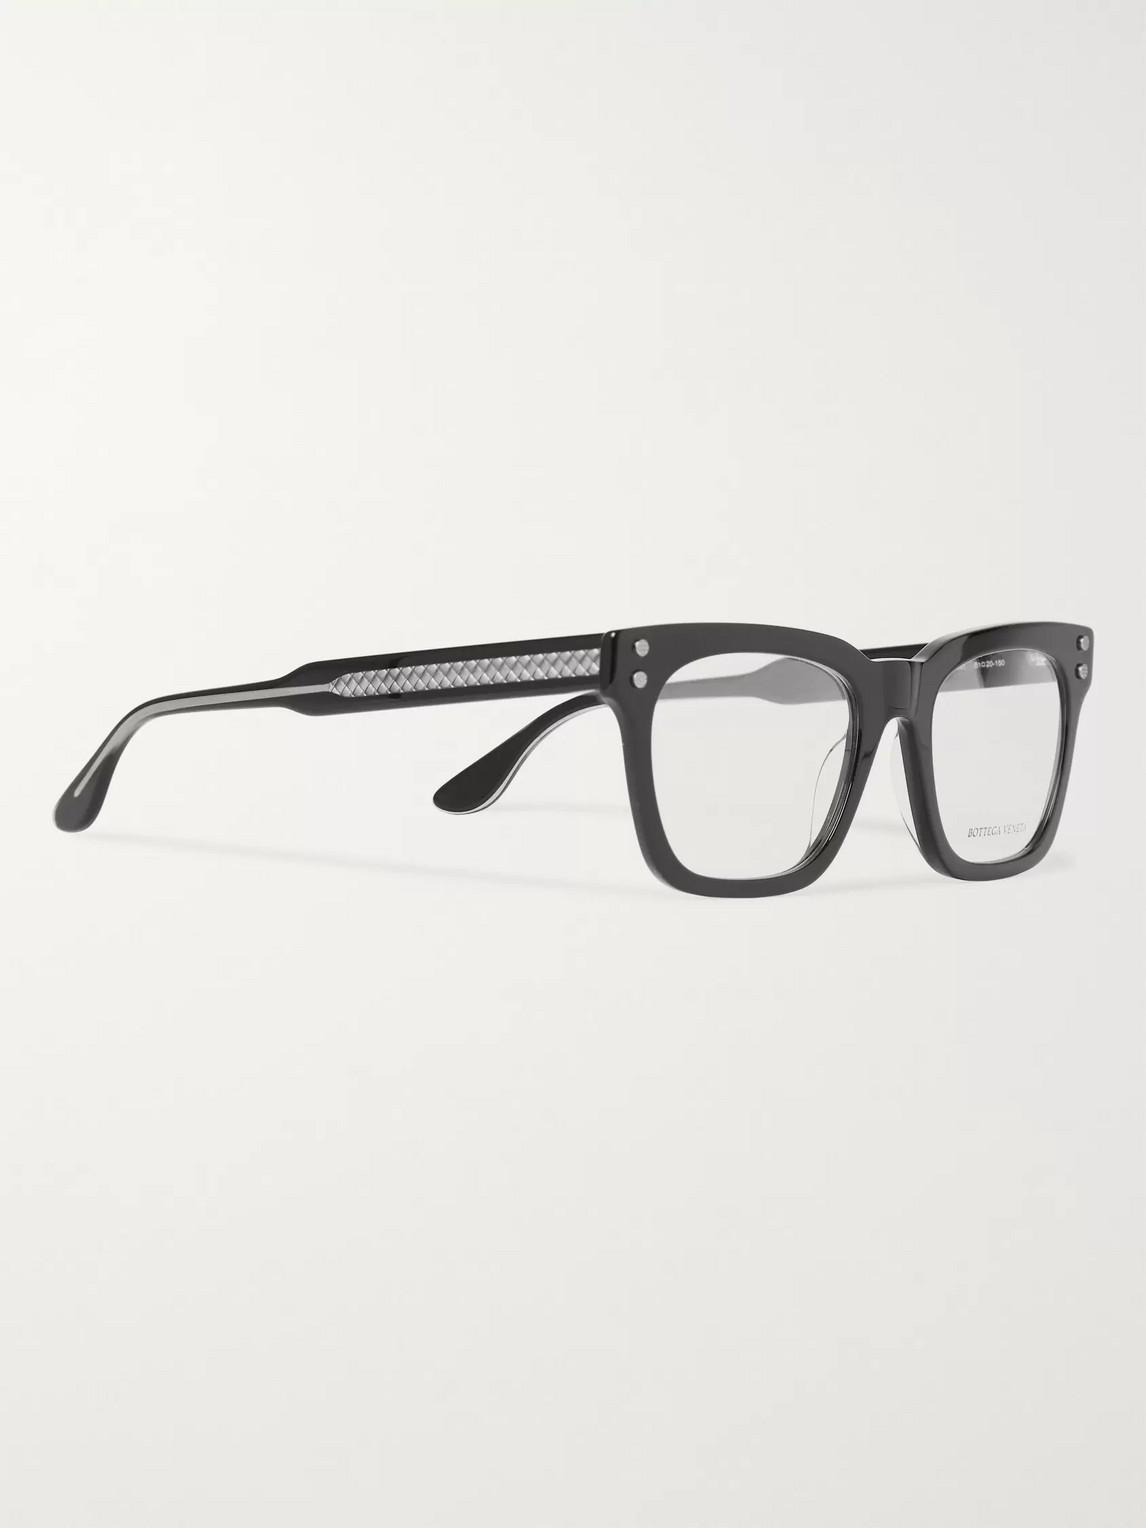 Bottega Veneta Opticals SQUARE-FRAME ACETATE OPTICAL GLASSES